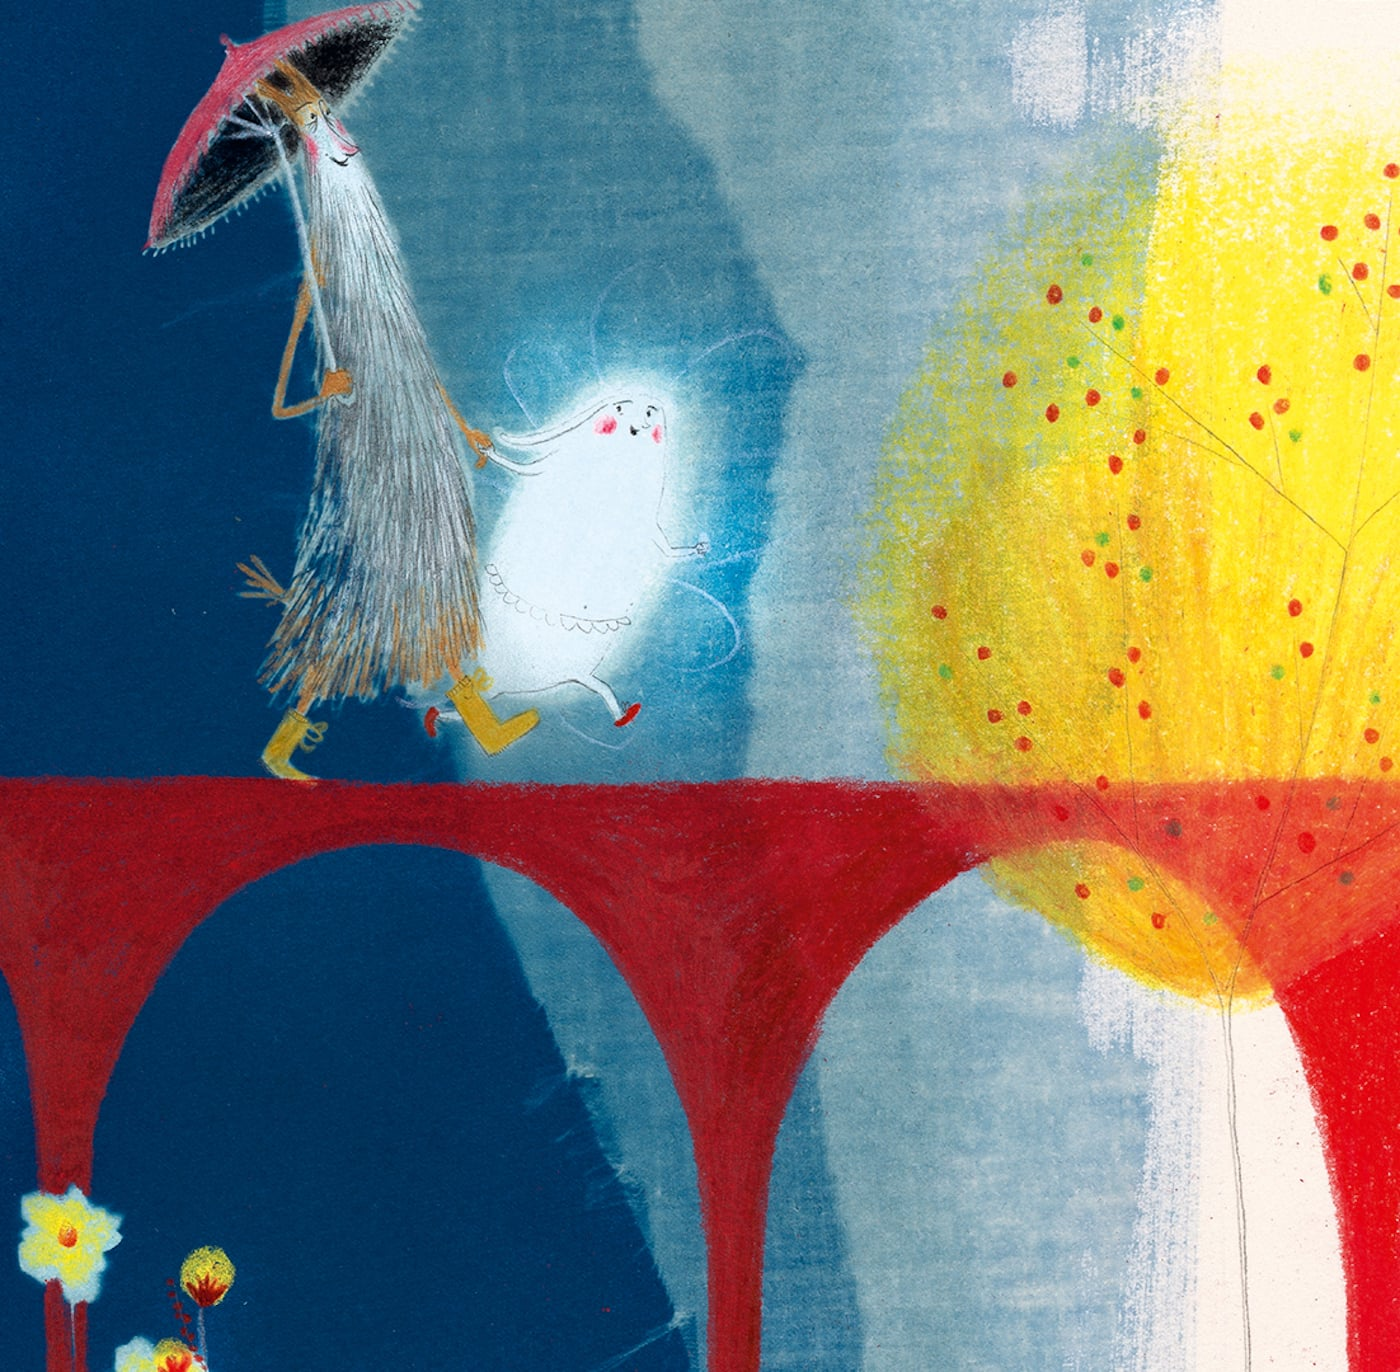 Kinderbuch-Lesung im PalaisPopulaire für Kinder in Berlin // HIMBEER